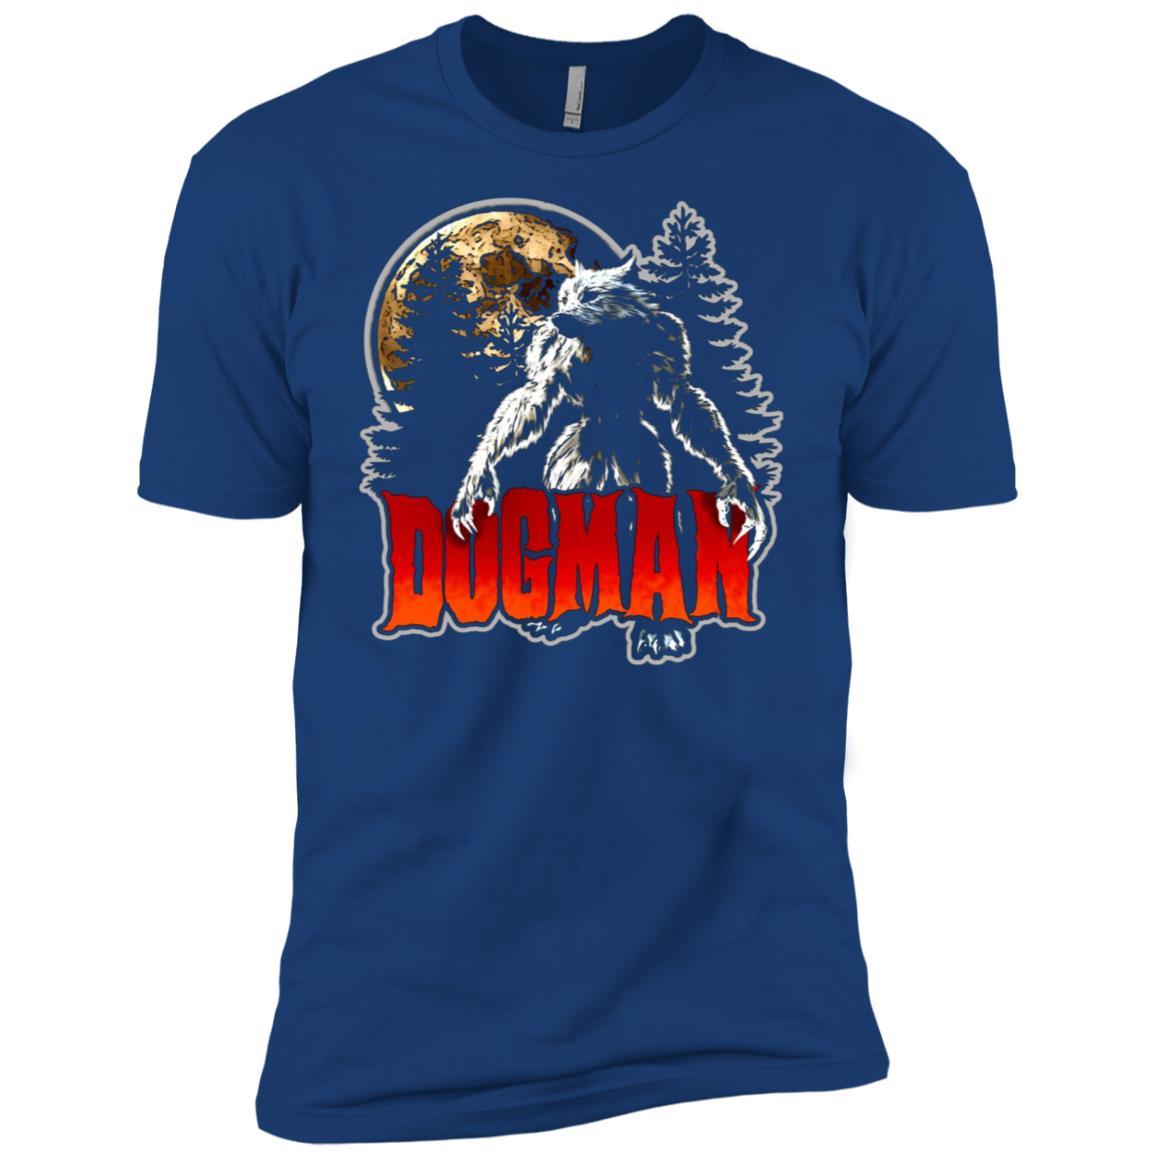 Dogman America's Werewolf Monster Cryptid Tee Men Short Sleeve T-Shirt